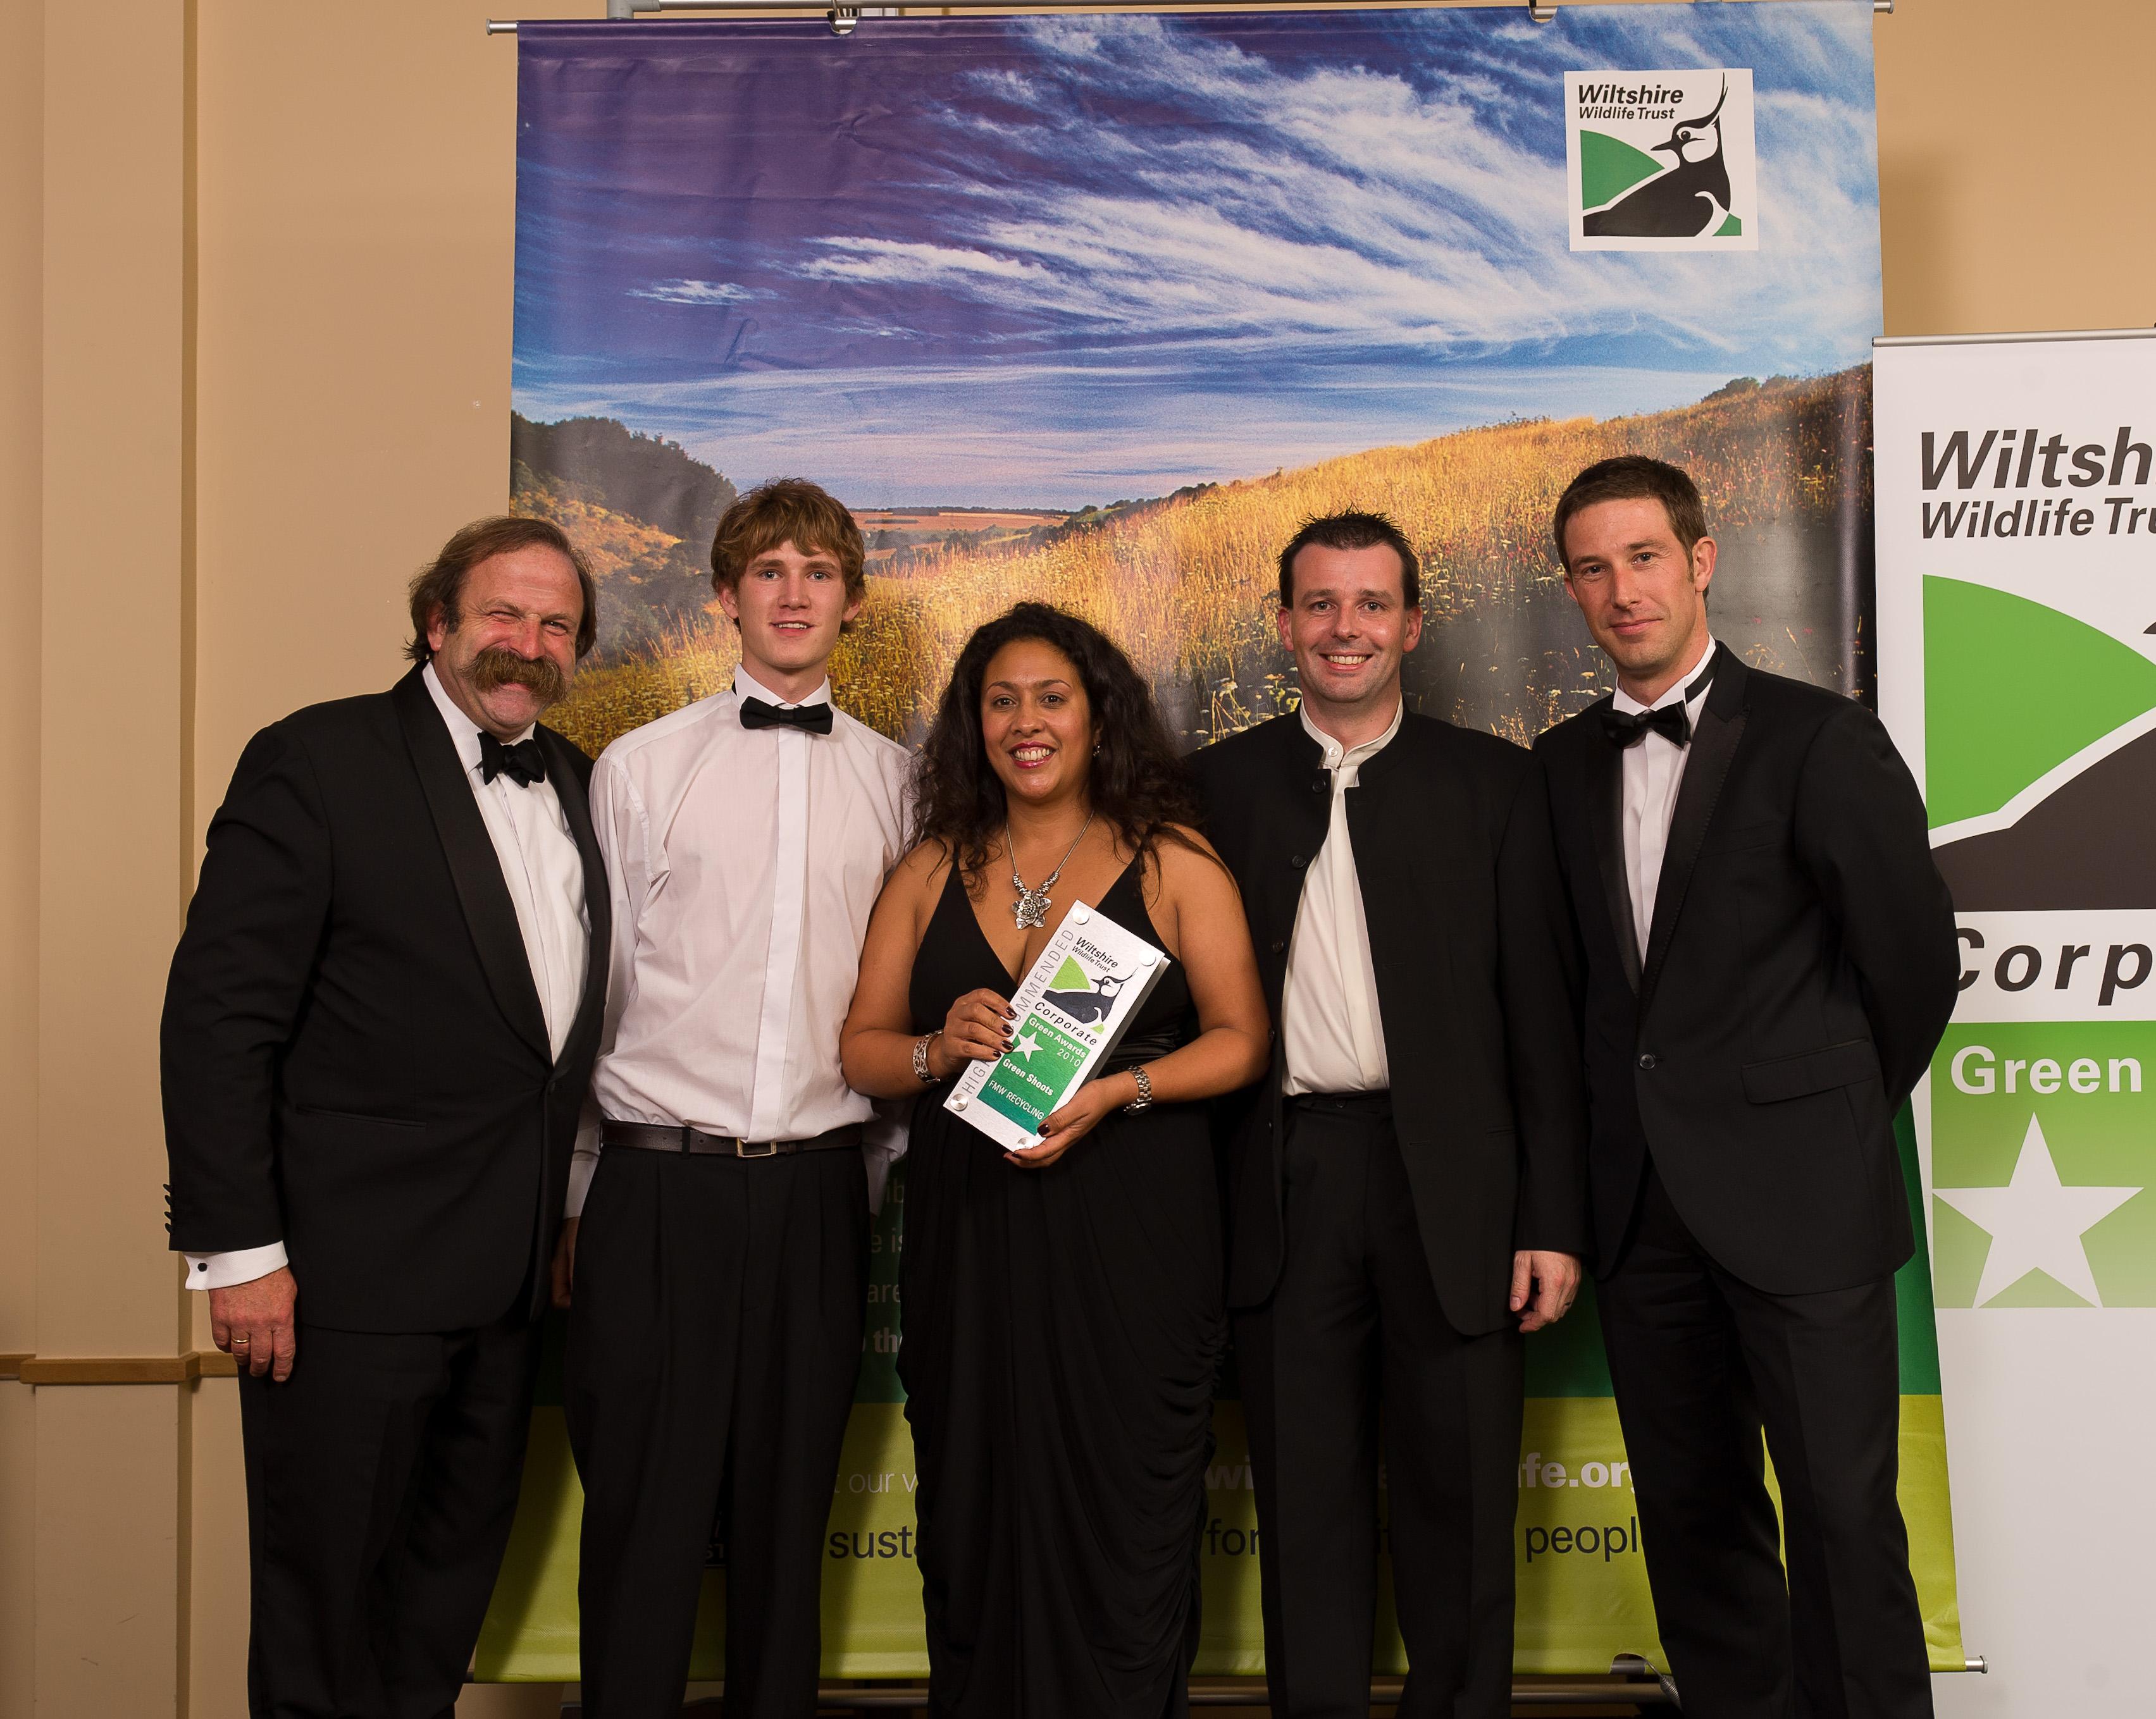 FMW wins Corporate Green Shoots award